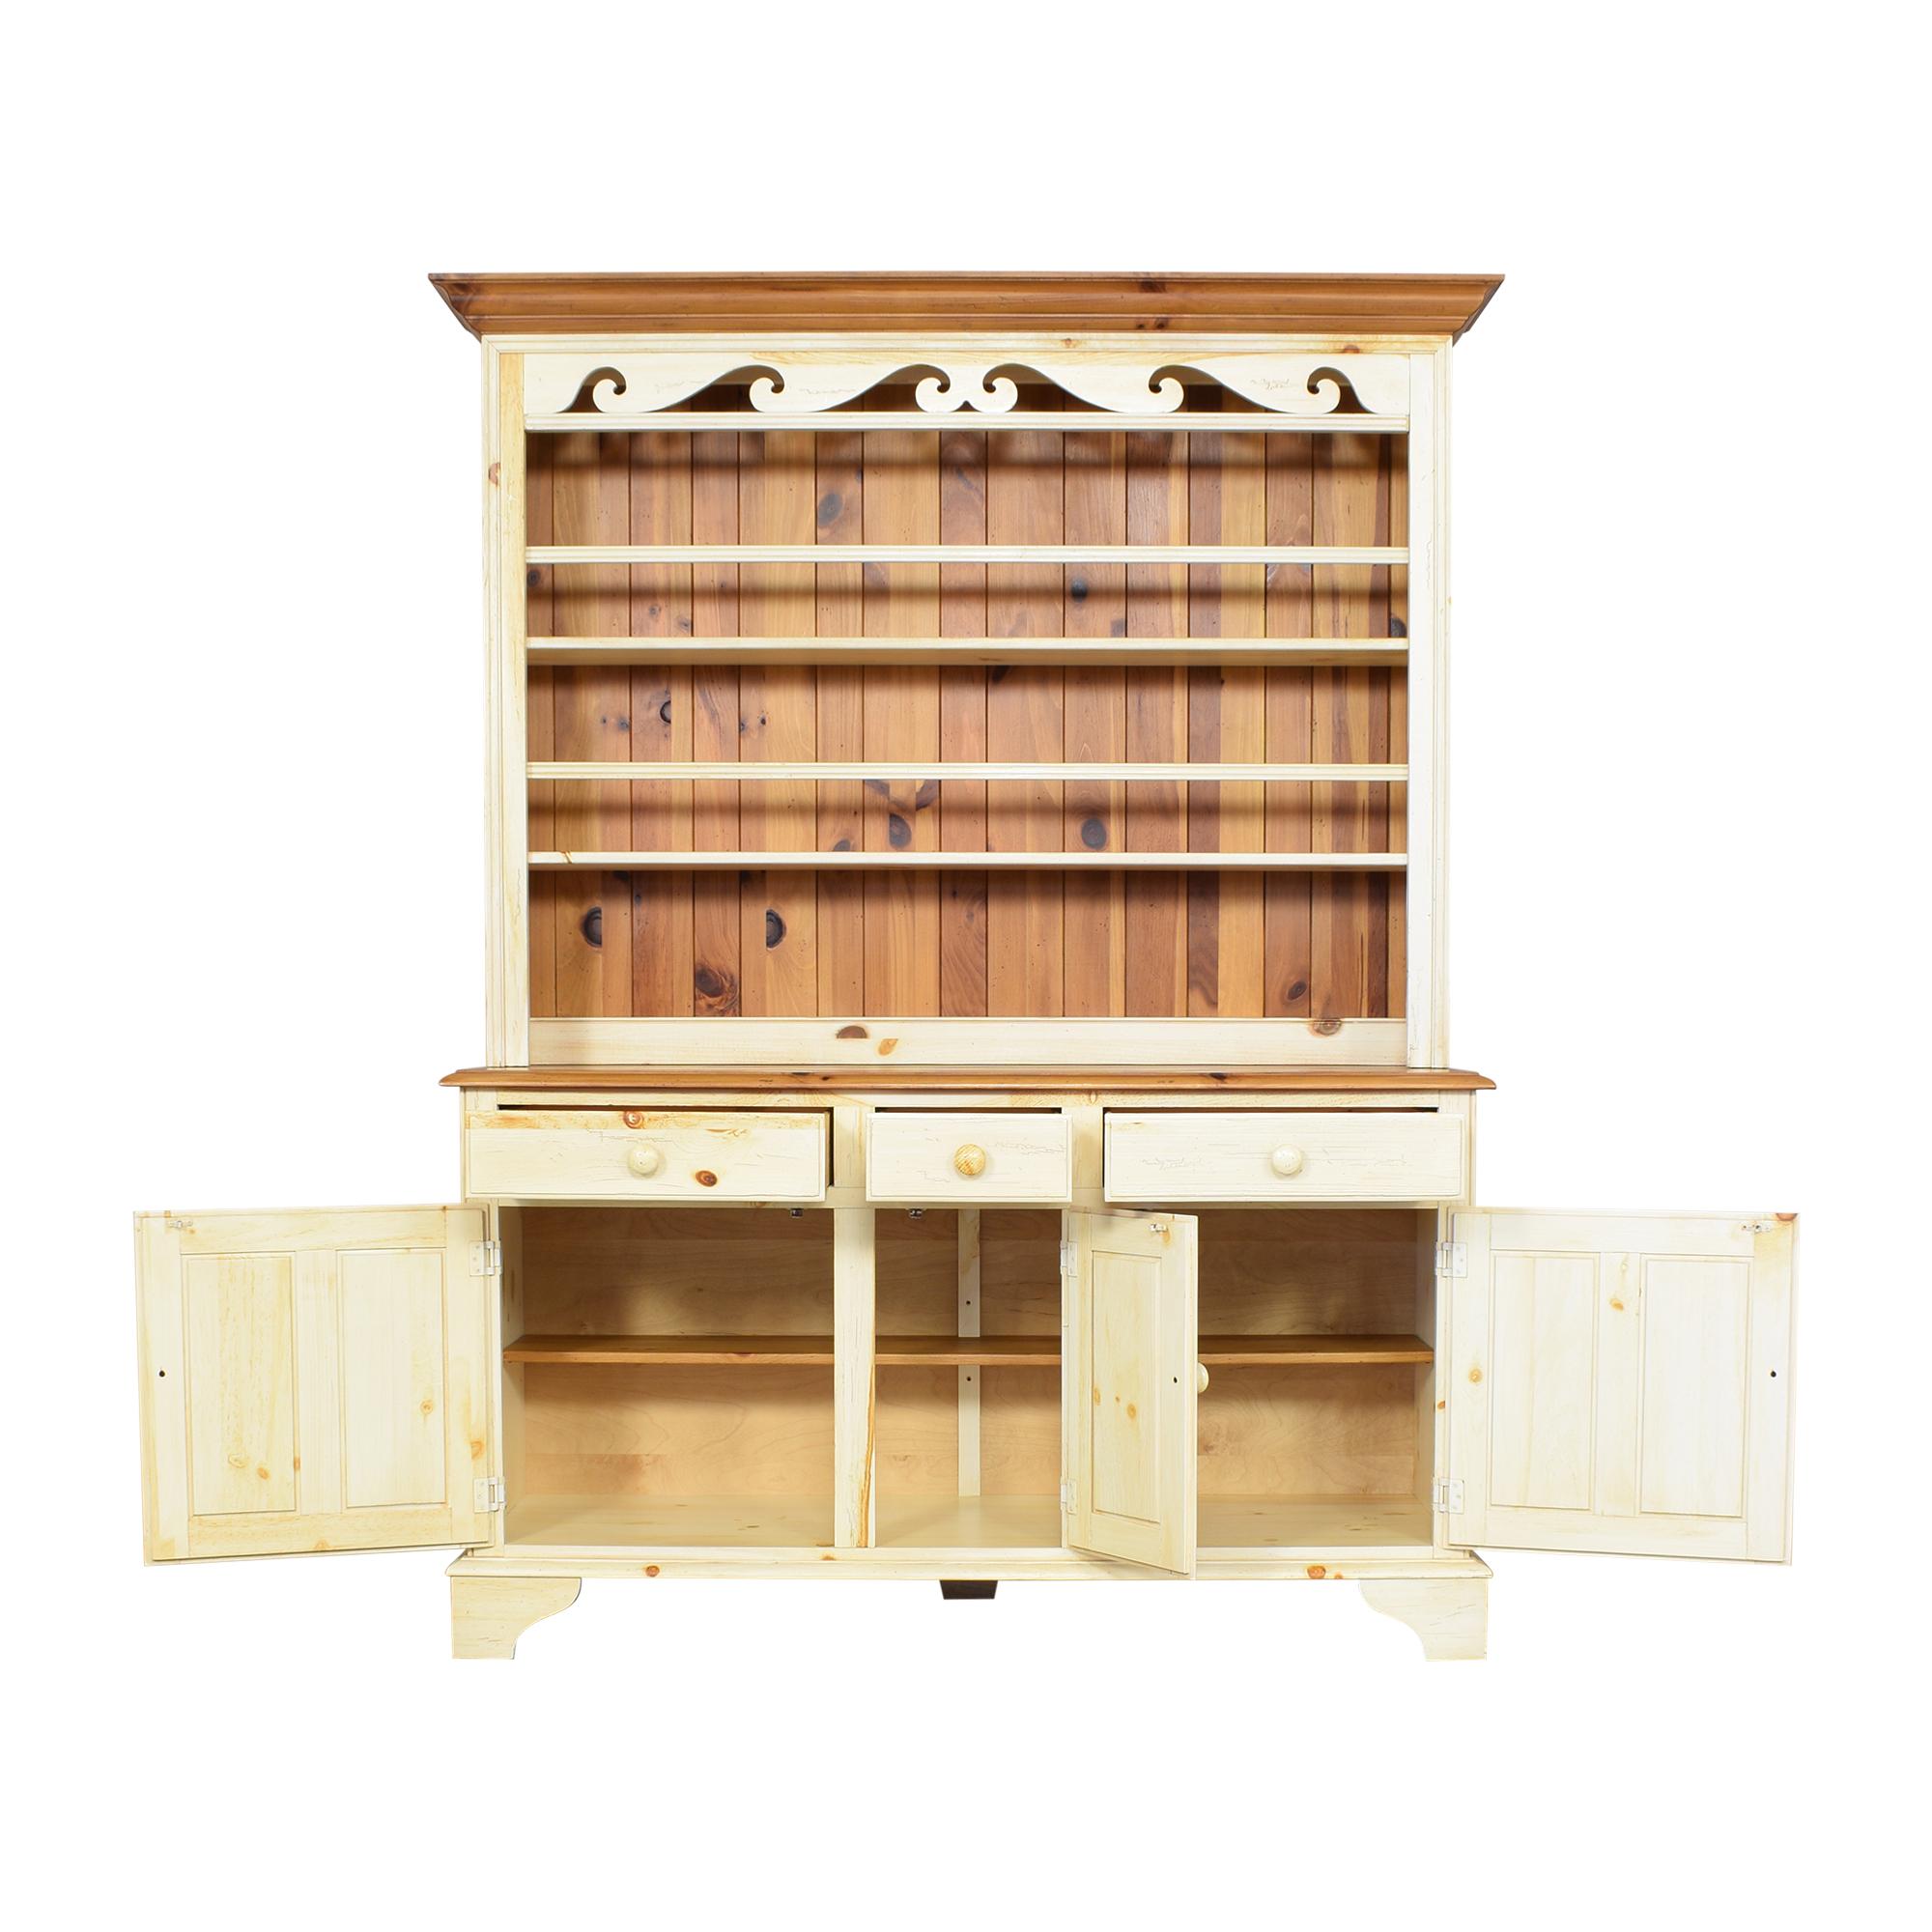 Ethan Allen Ethan Allen Farmhouse Cabinet with Hutch